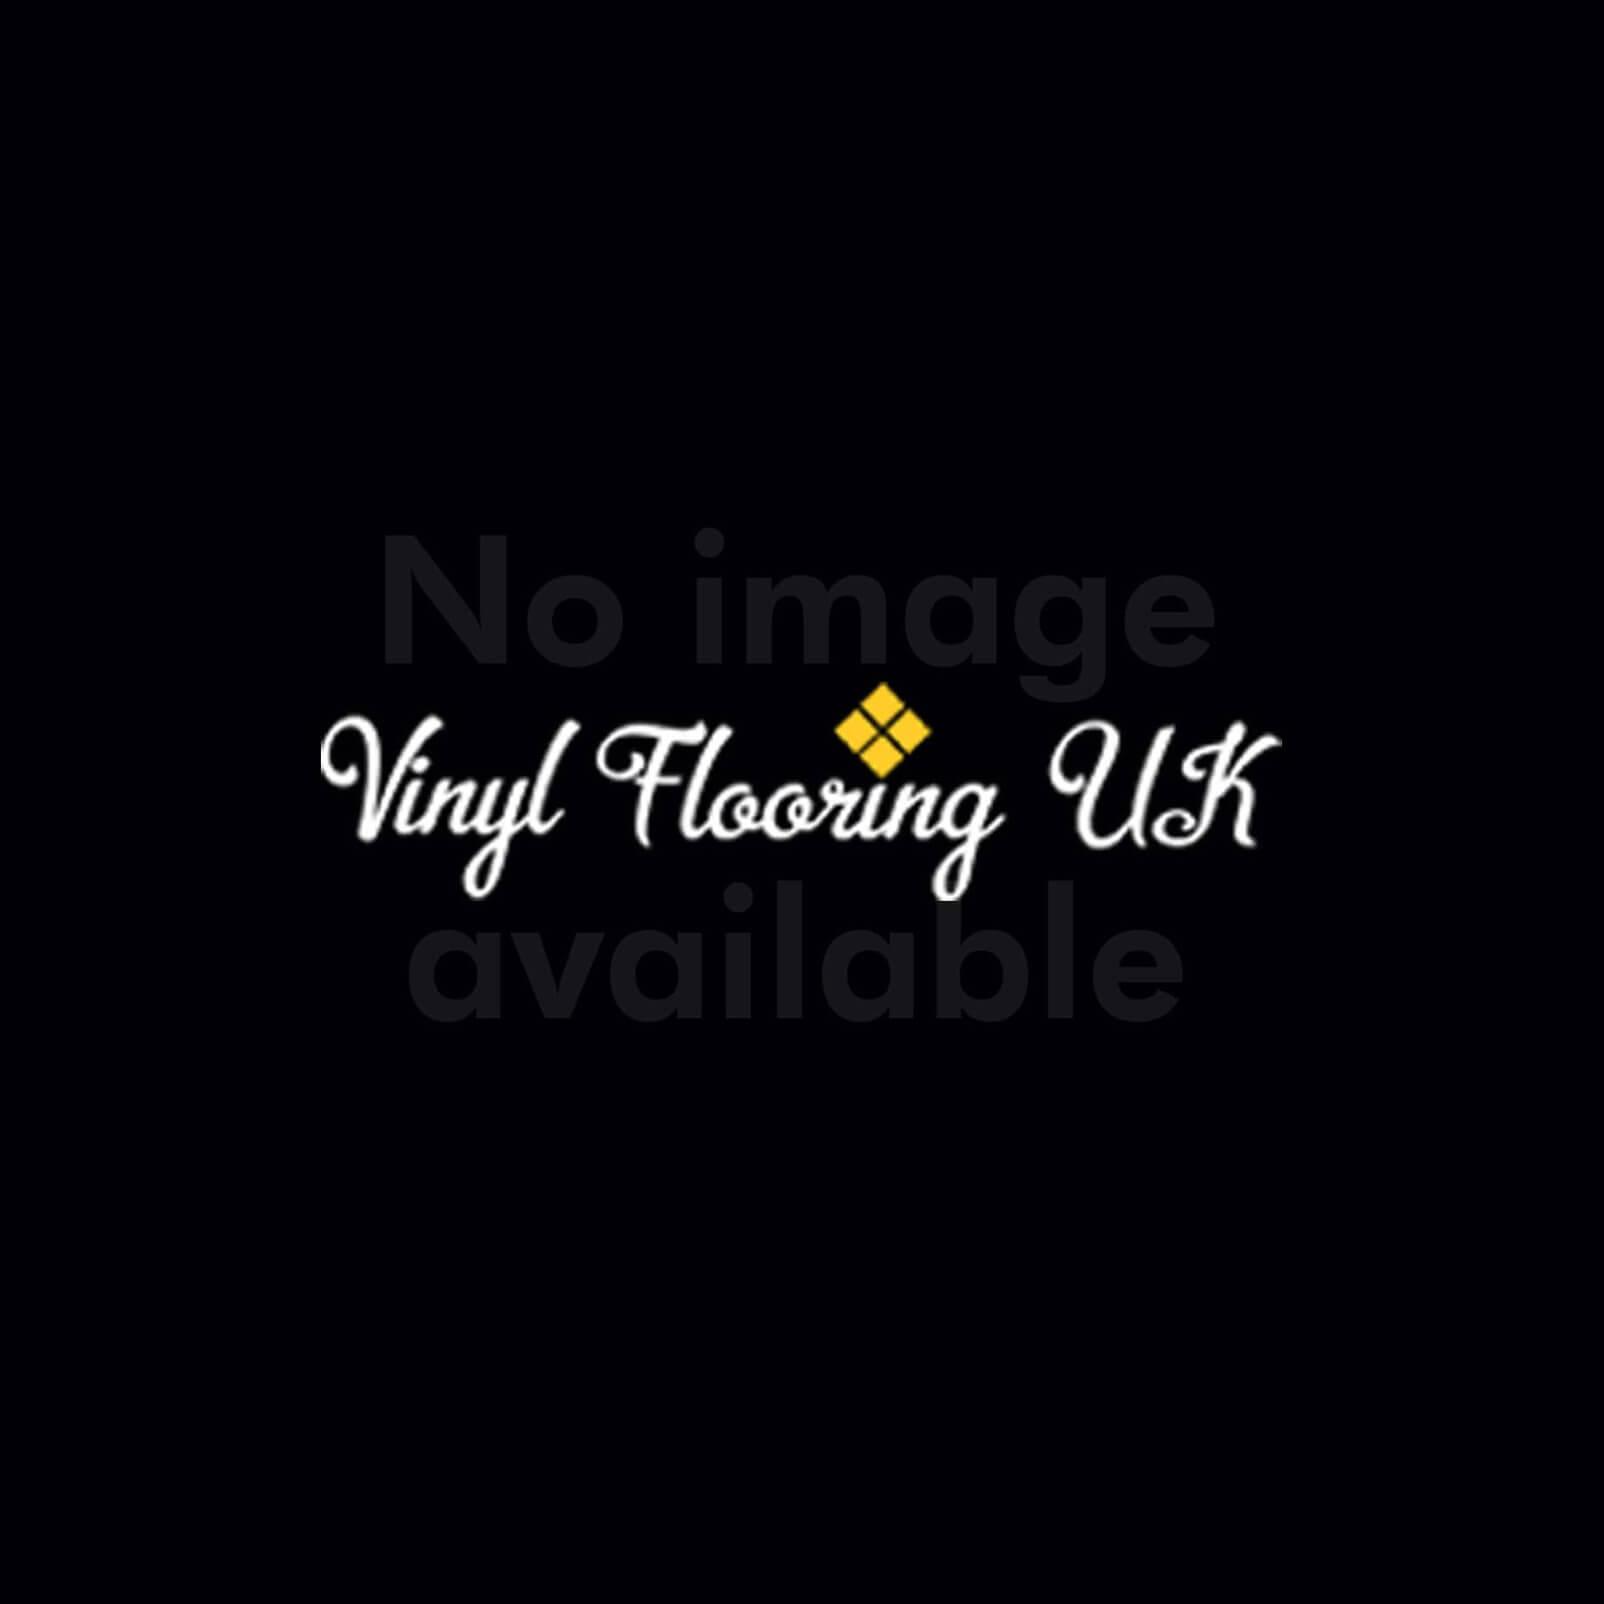 3 mt (width) by 3.1 mt (length) 3D Tile Effect Anti Slip Vinyl Flooring